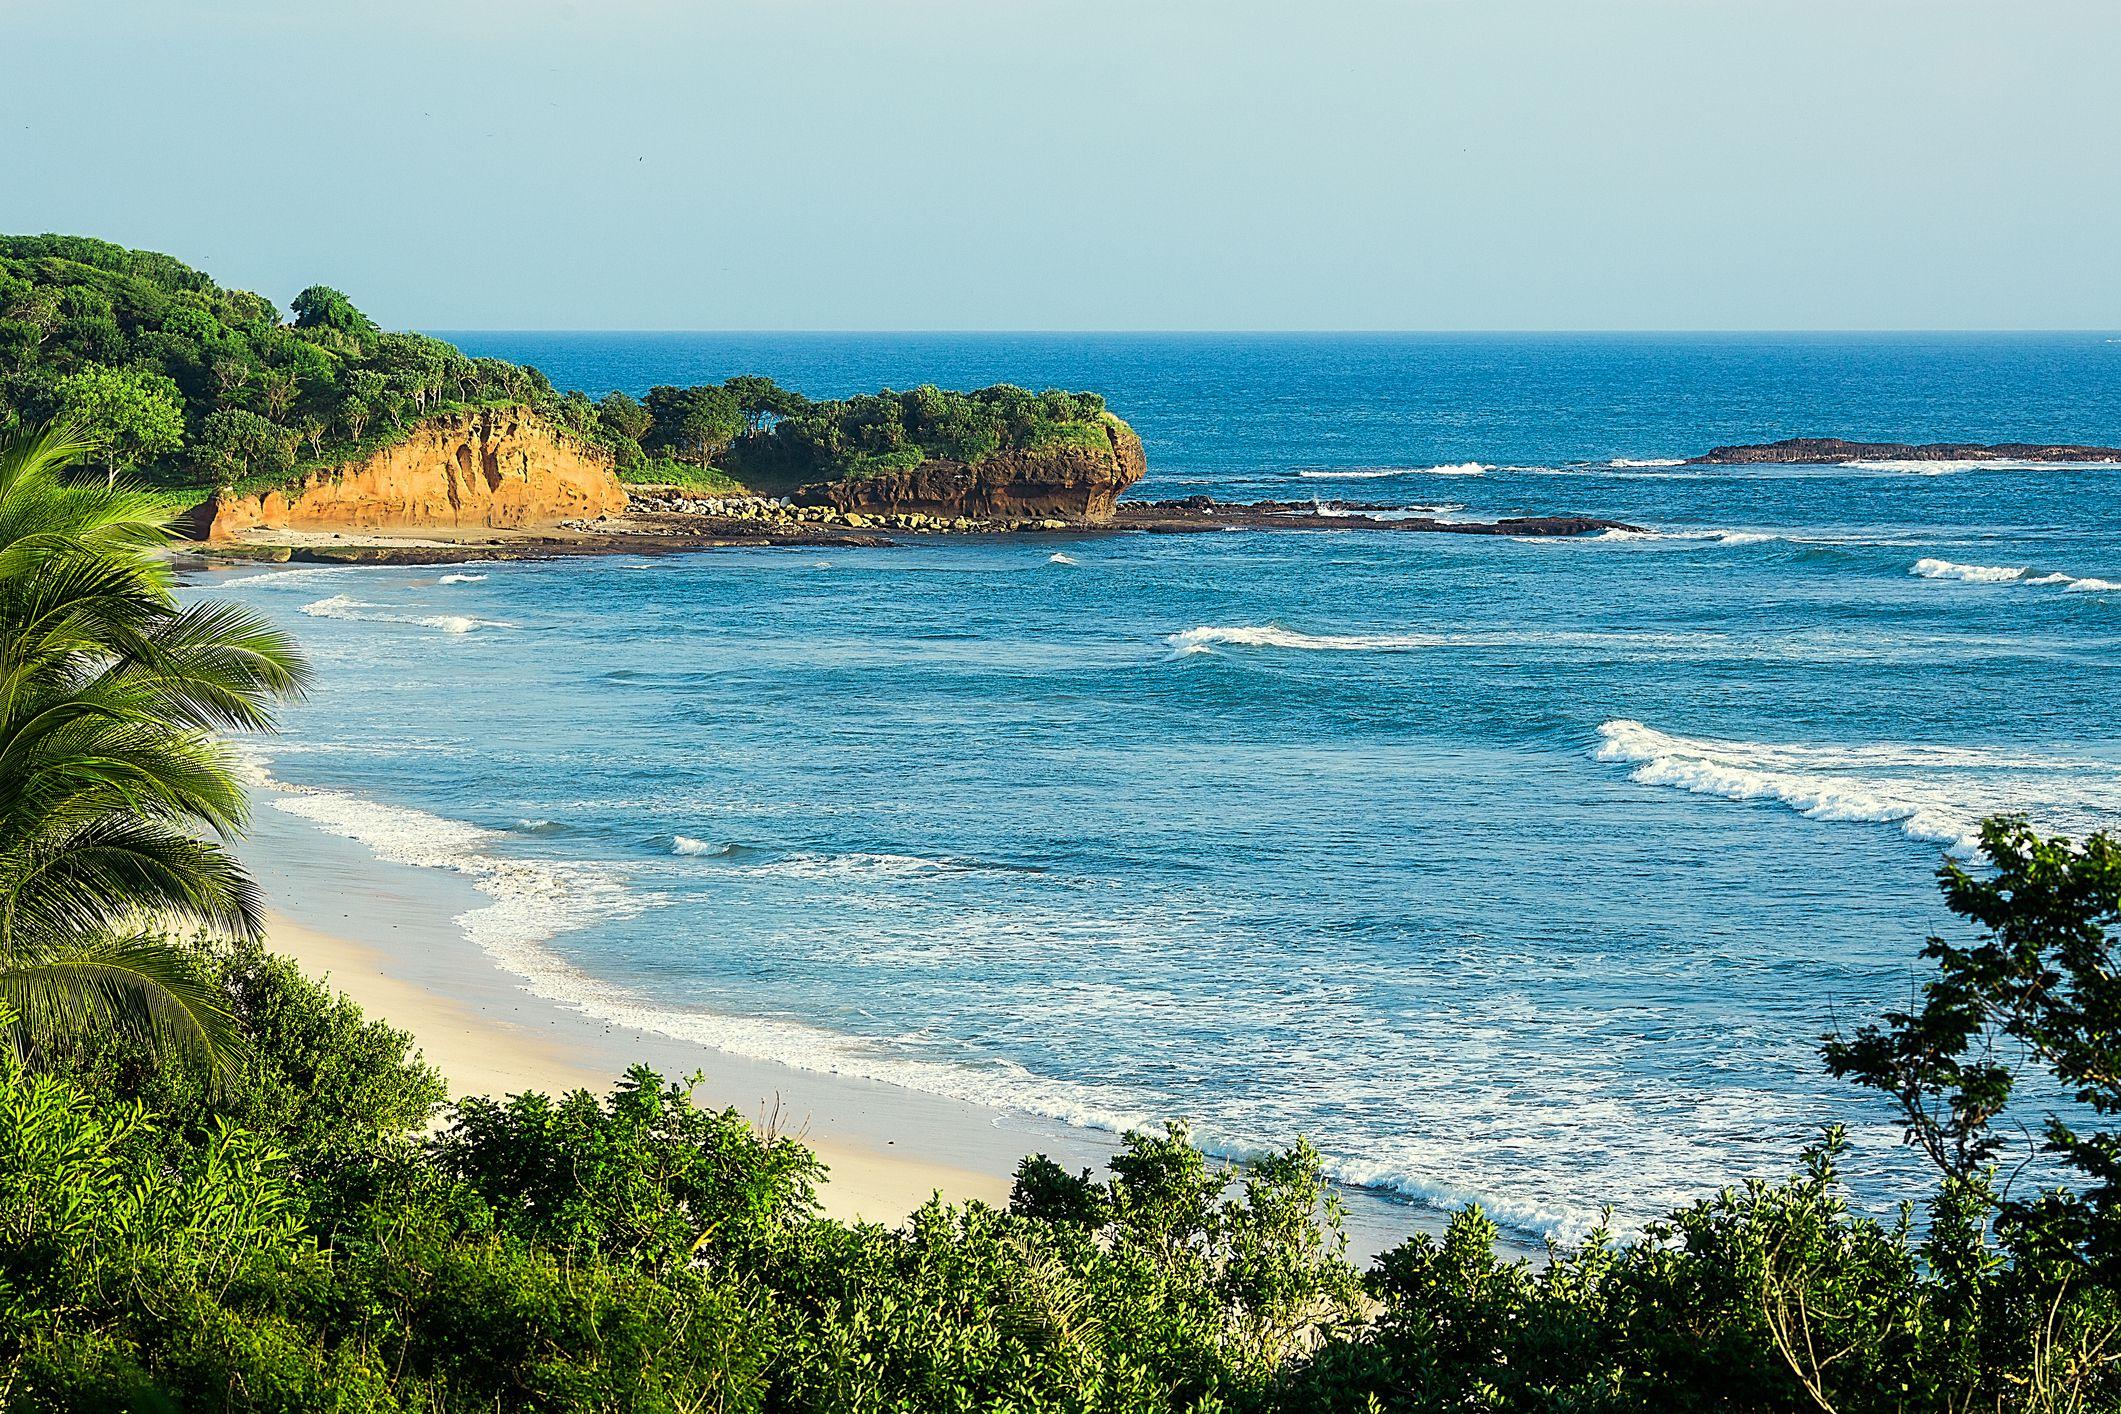 Punta de Mita has breath taking beaches